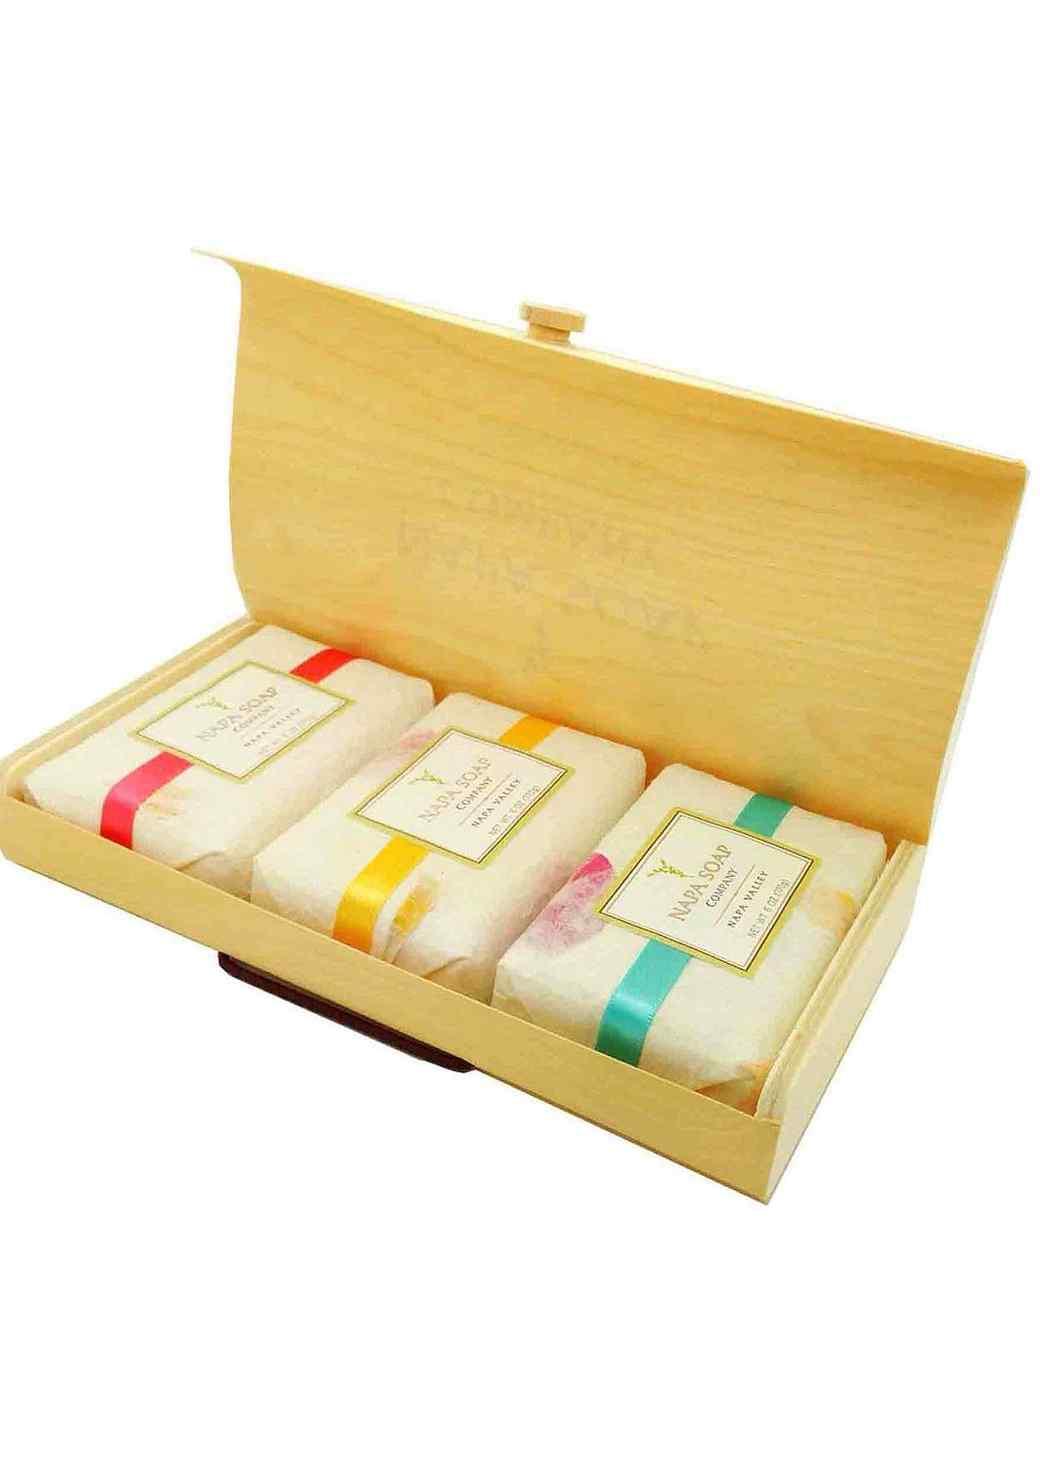 napa-soap-set-1215.jpg (skyword:209221)